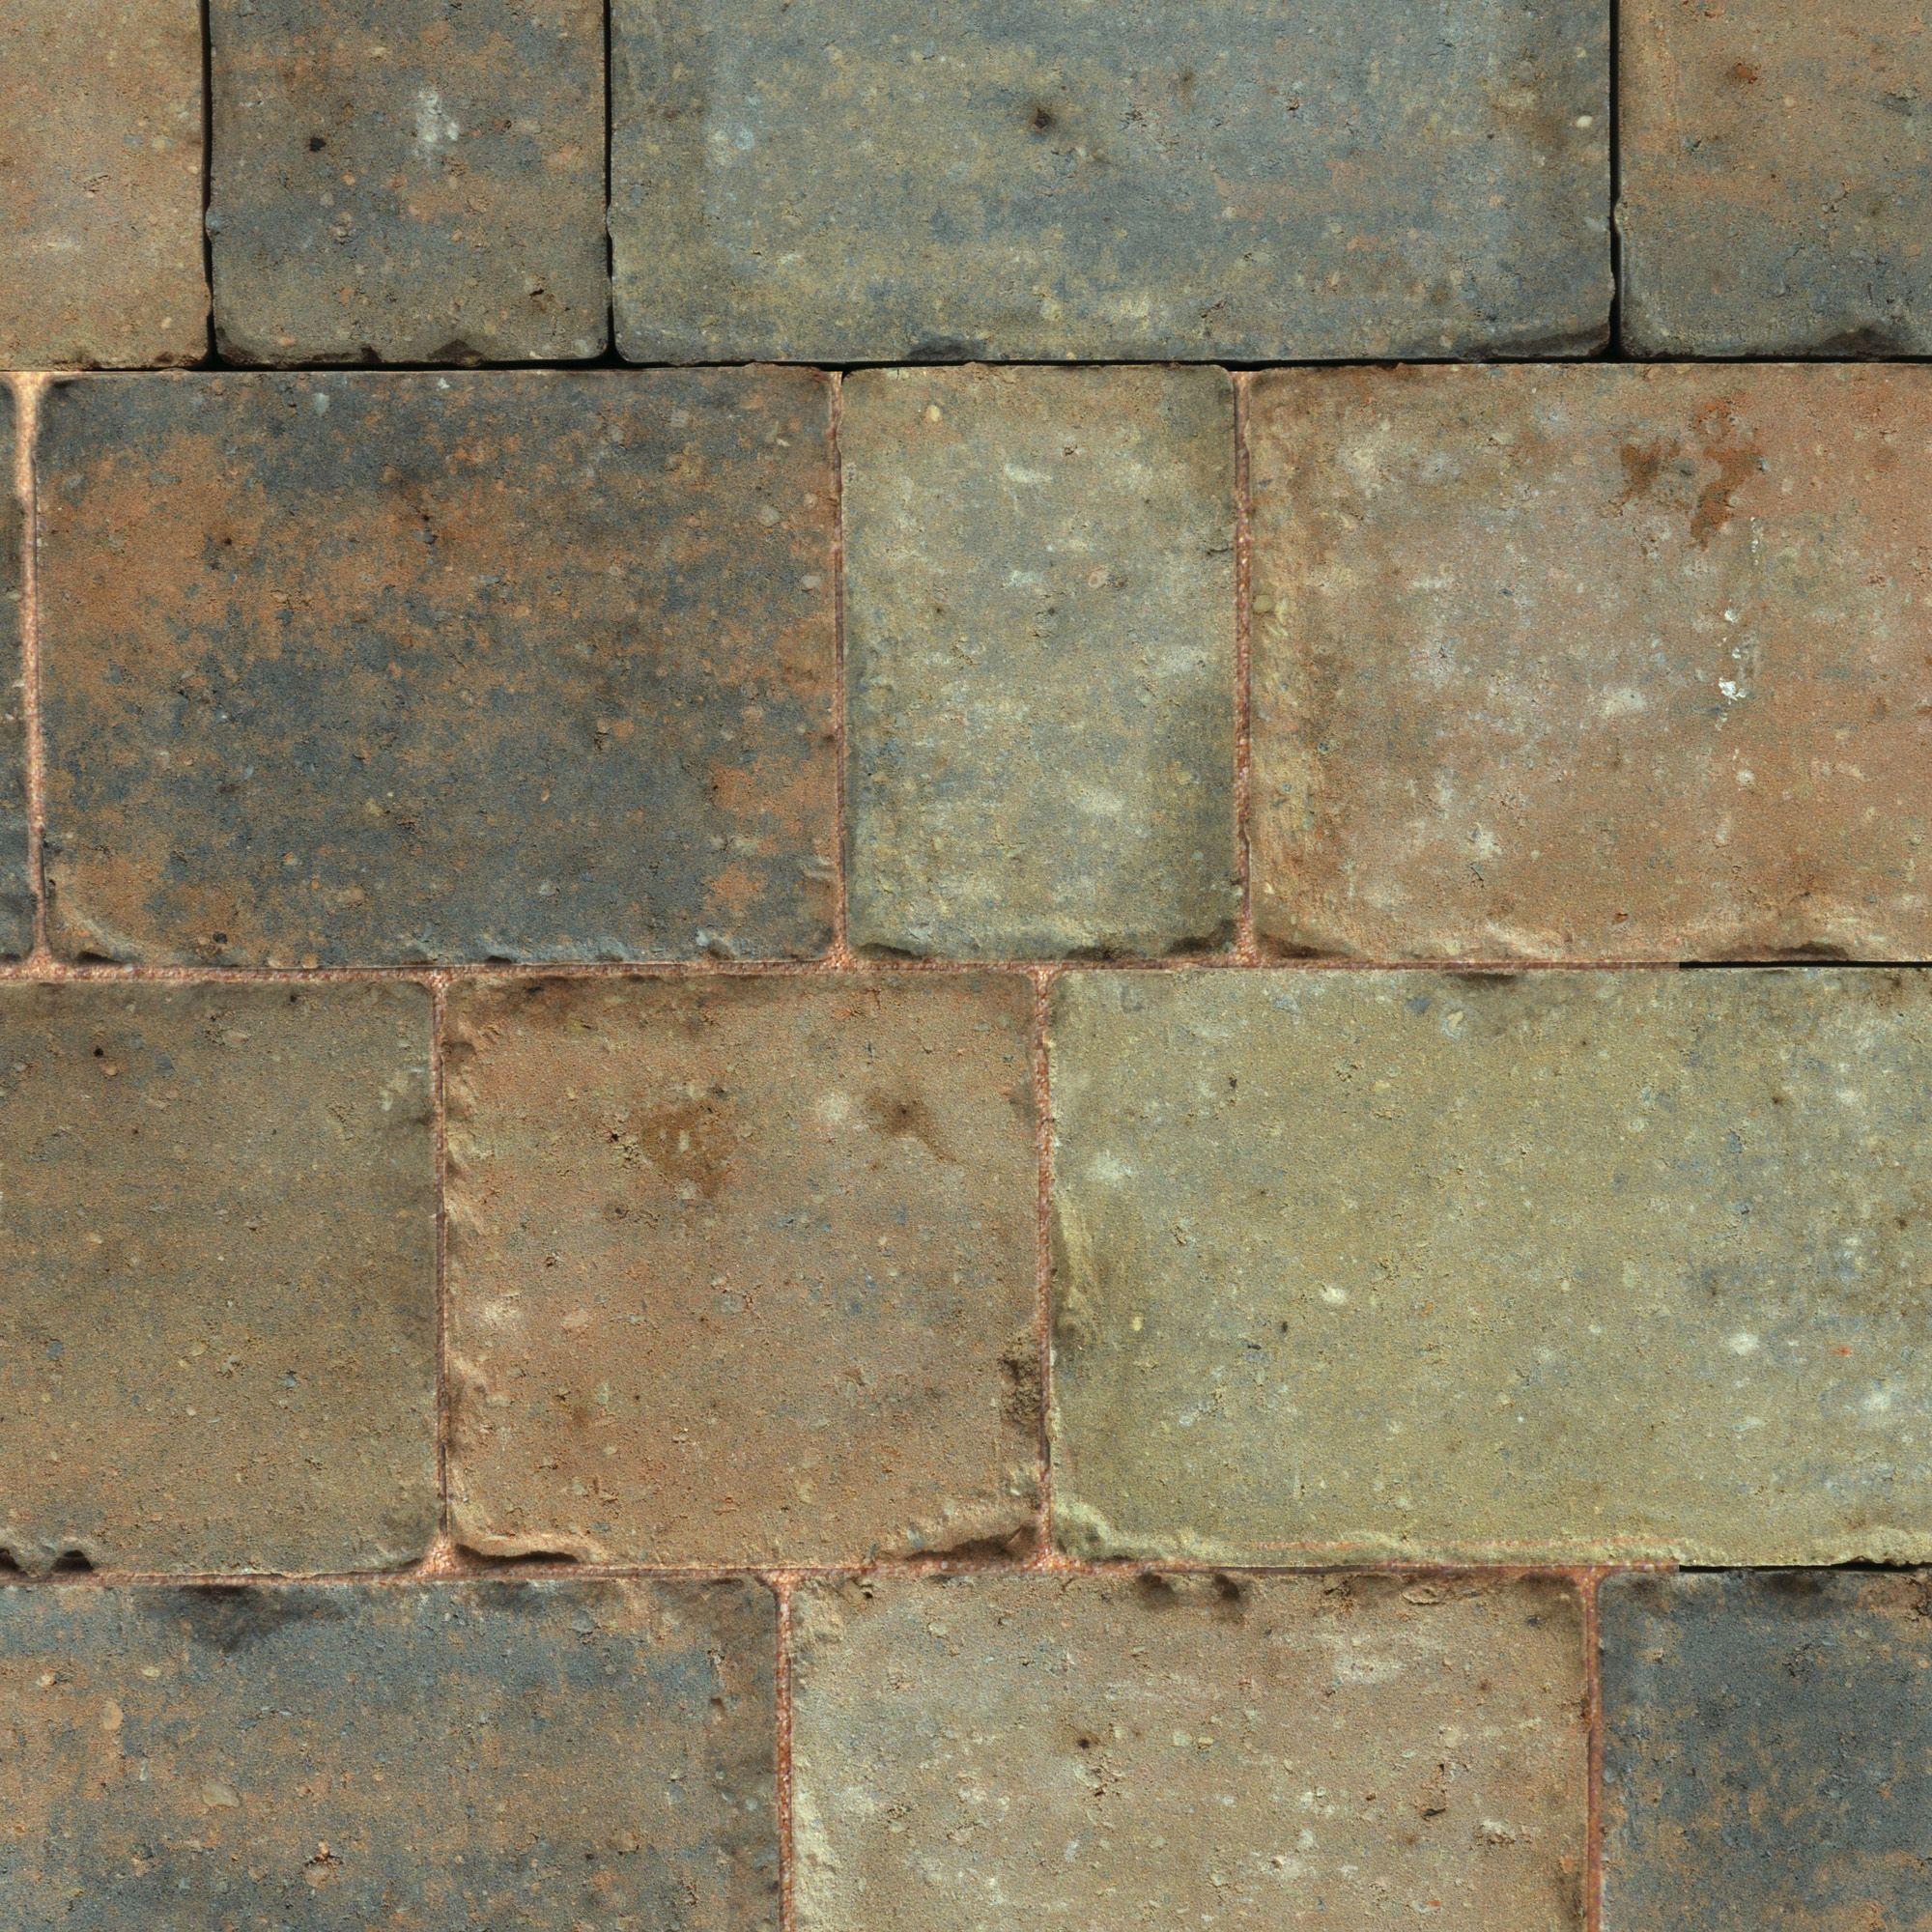 Jewsons Block Paving >> Croft Monksbridge Block Paving 9 60m Departments Diy